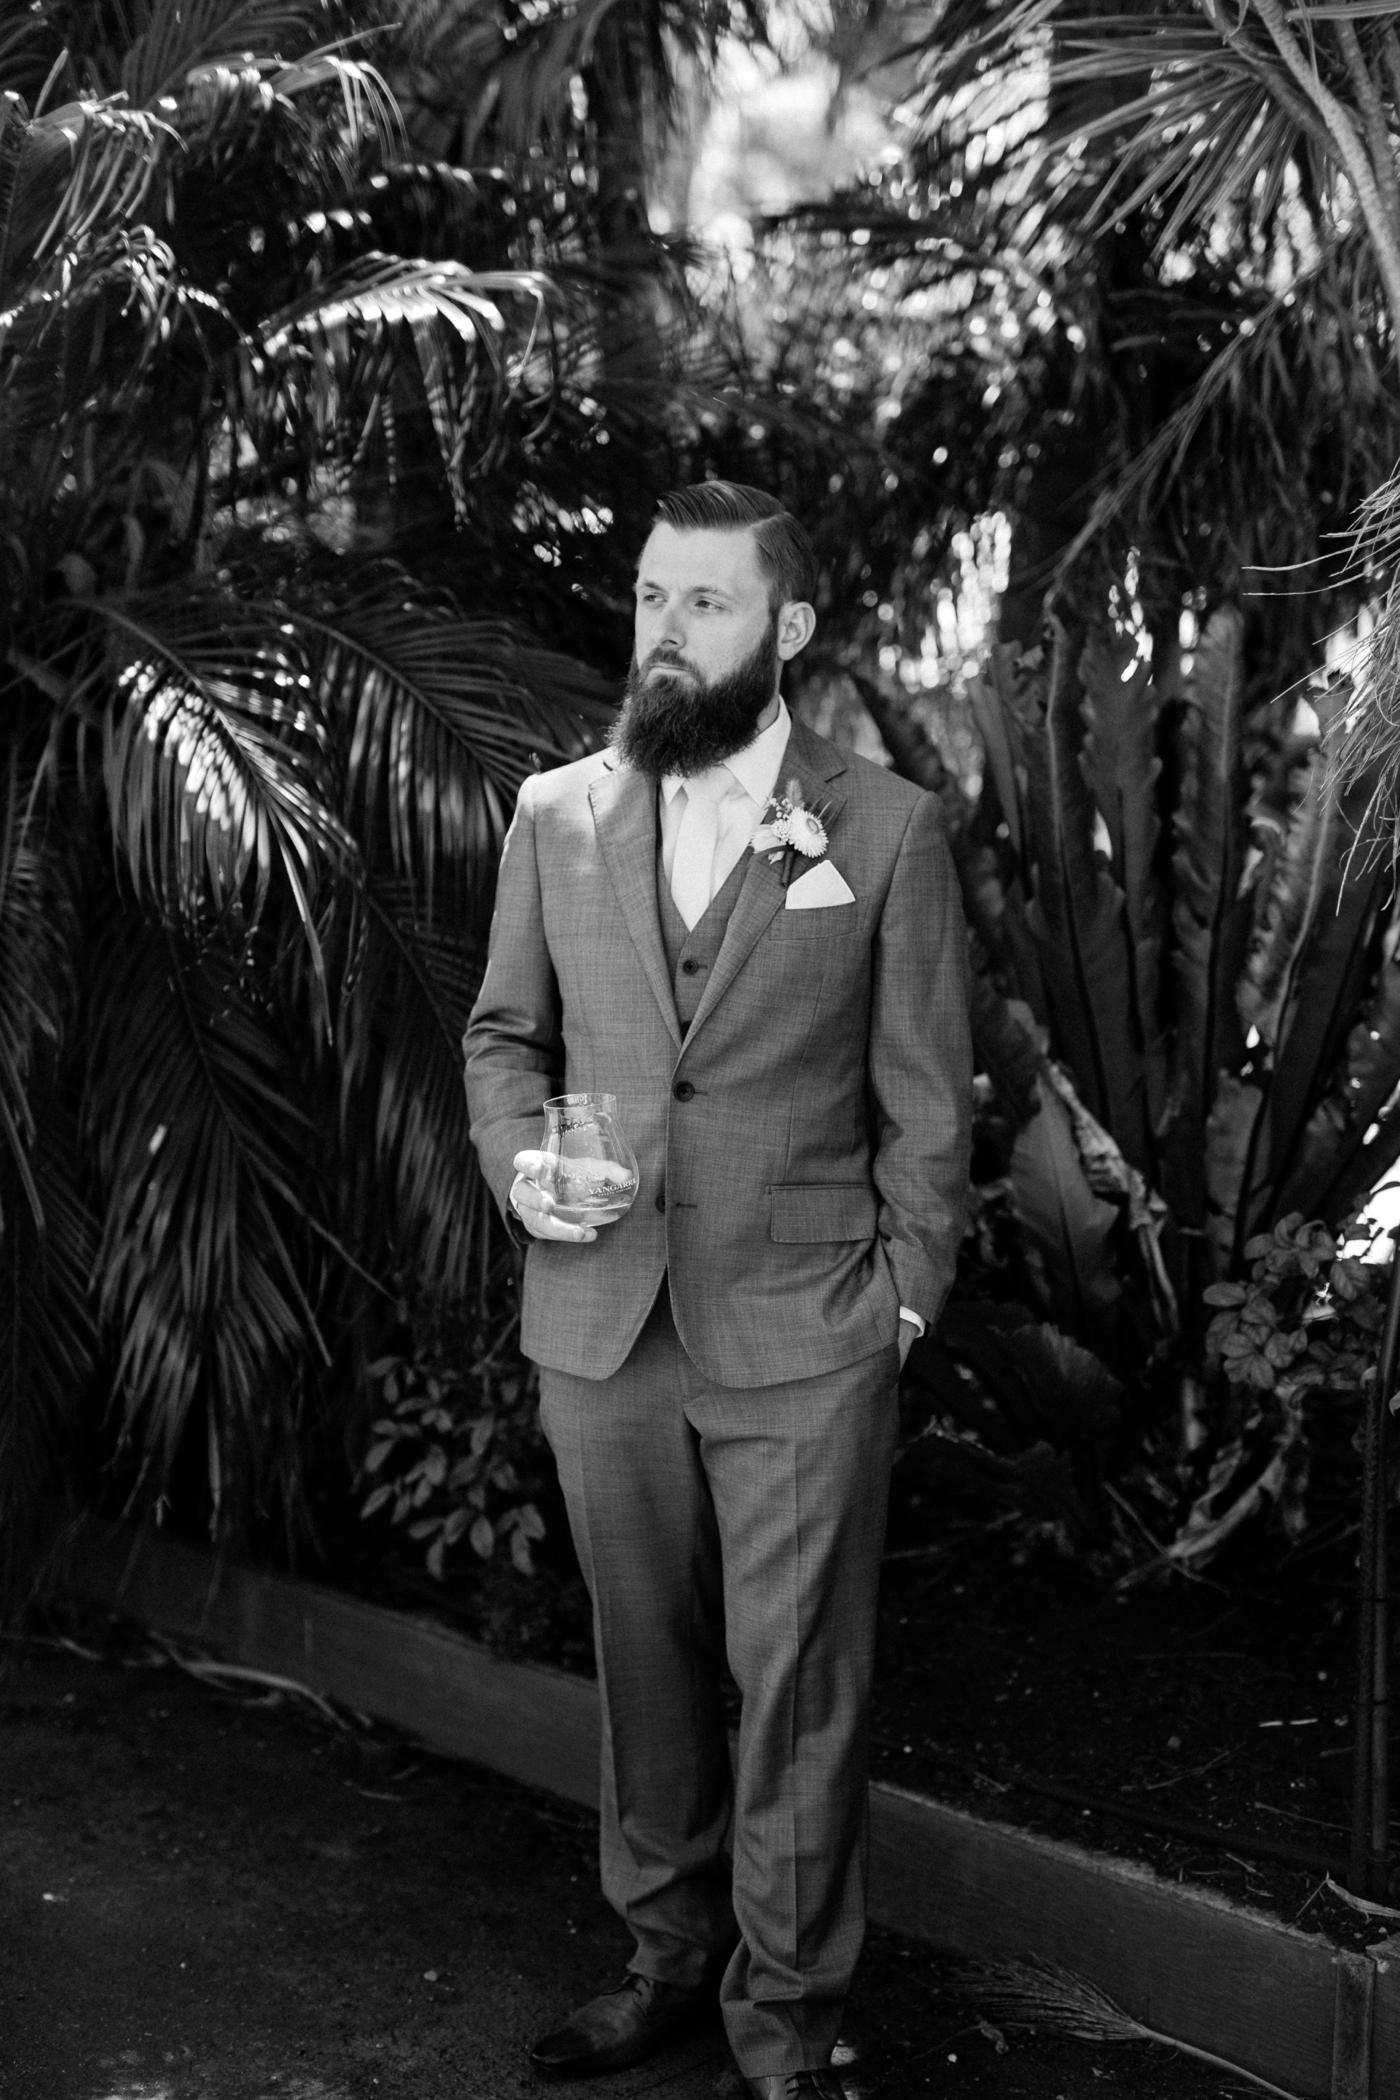 Maddy & Wes - K1 by Geoff Hardy Wedding - Adelaide Wedding Photographer - Natural wedding photography in Adelaide - Katherine Schultz_0006.jpg